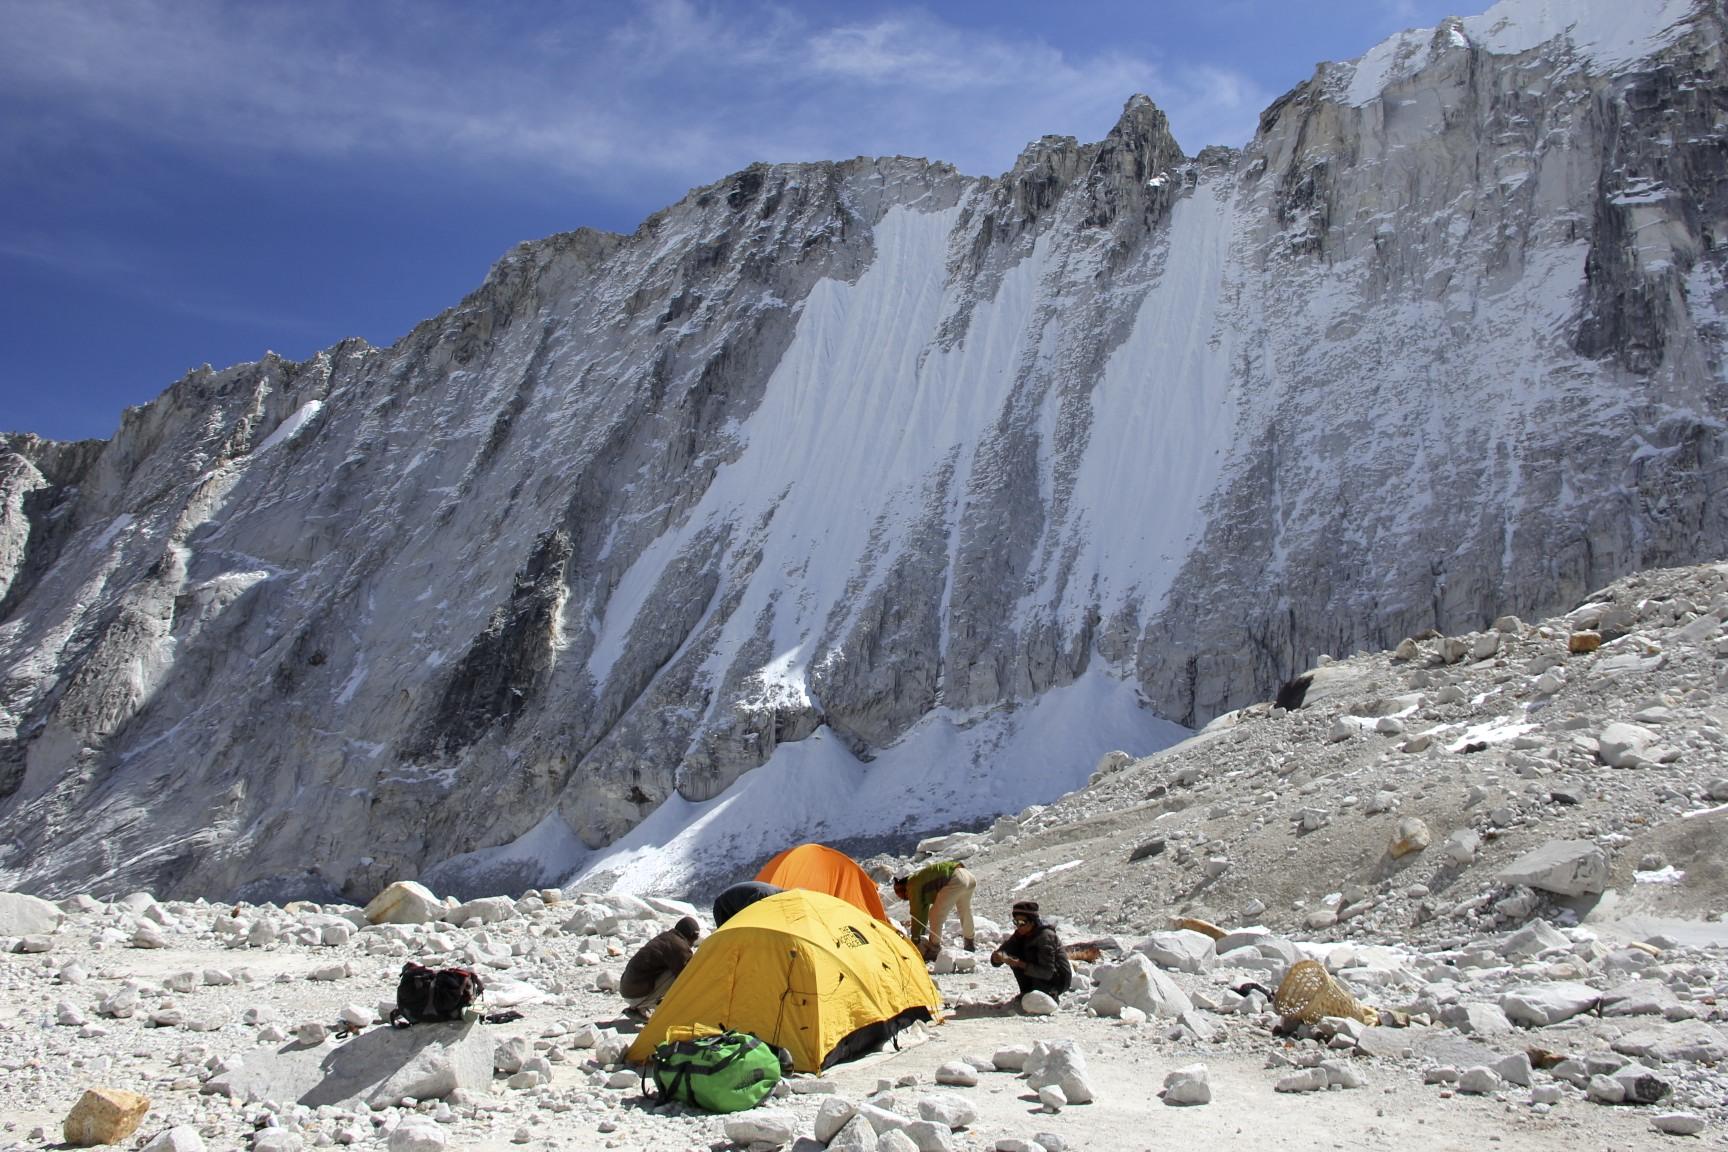 Sherpani Col BC